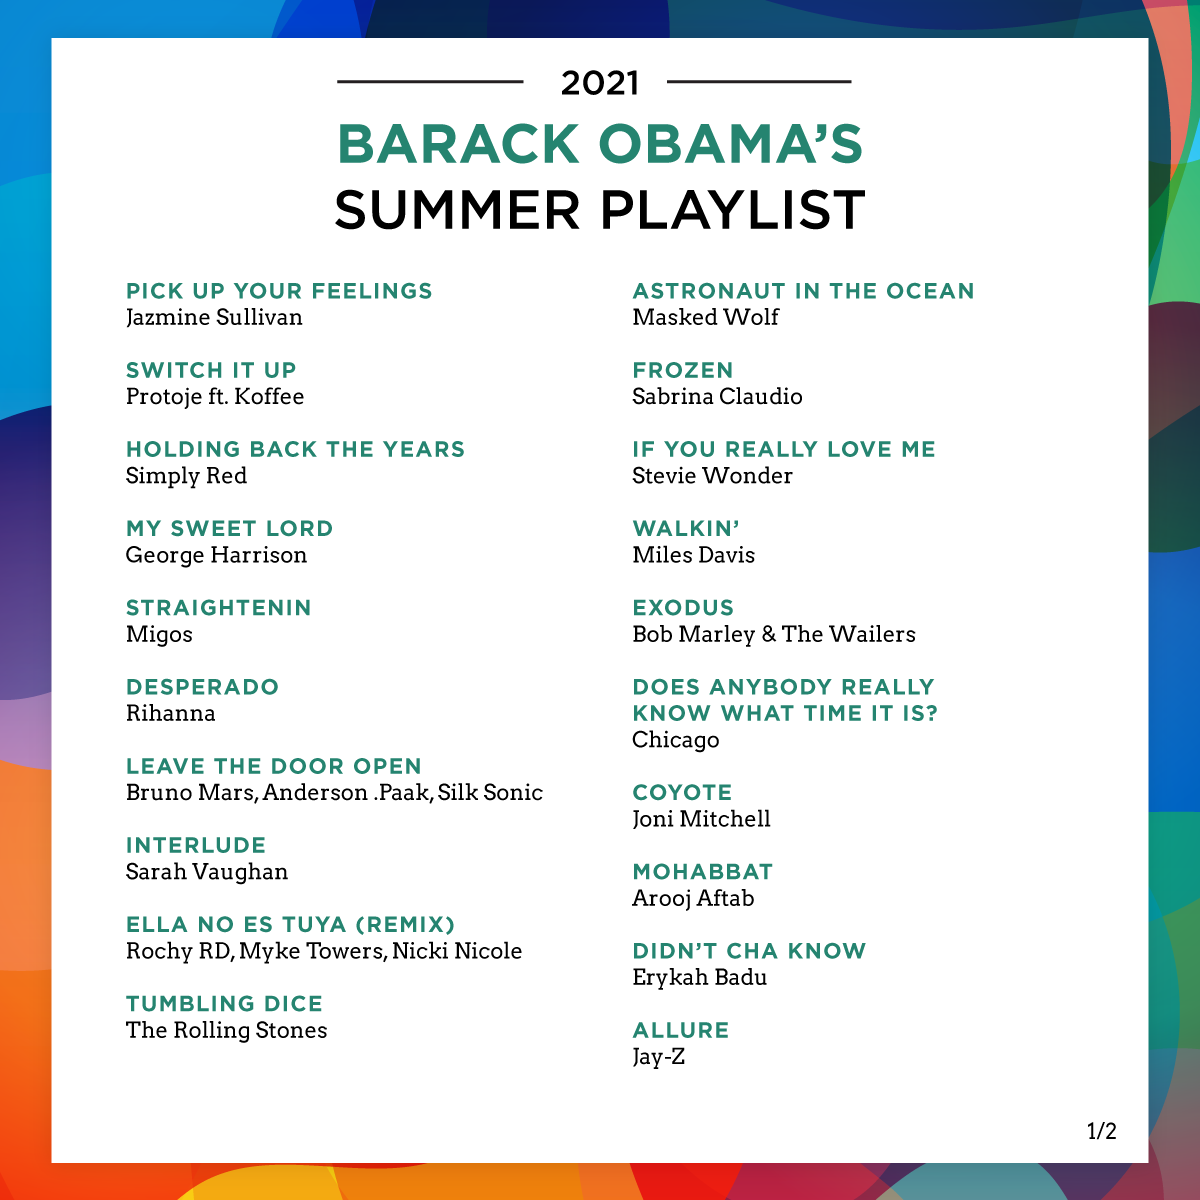 Infographic: Barack Obama's 2021 Summer Playlist